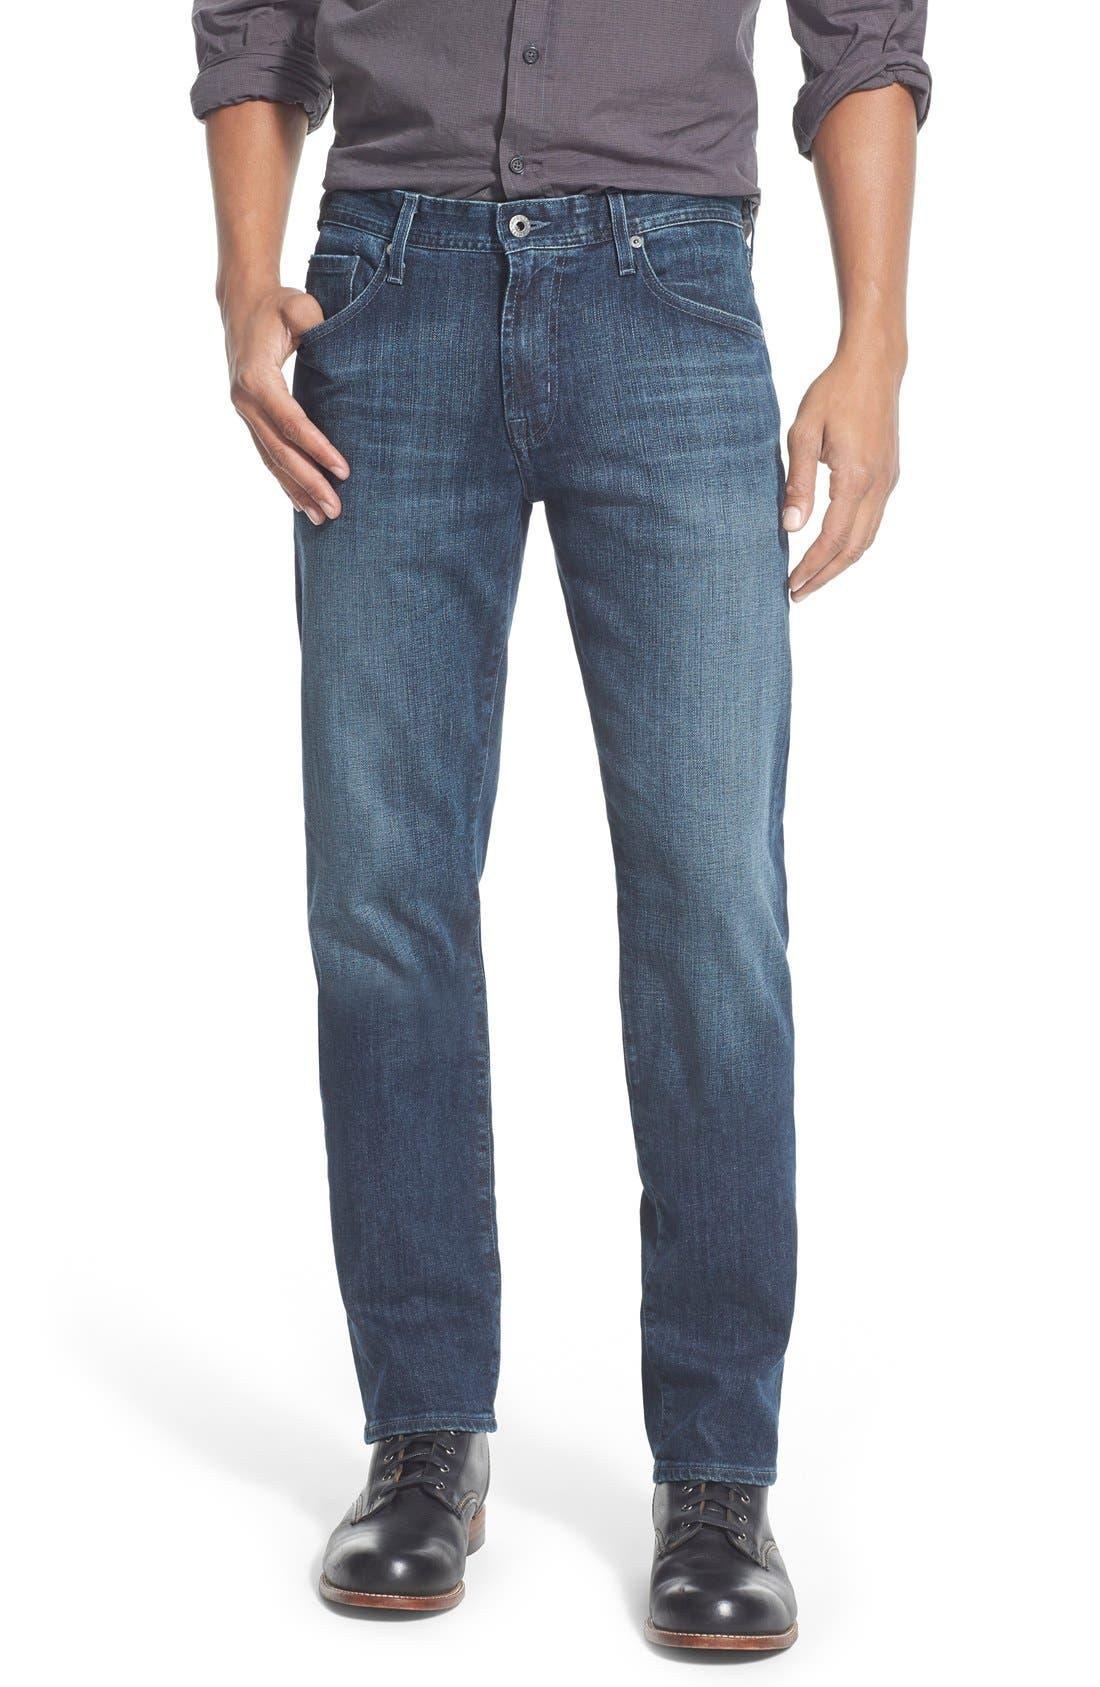 AG 'Graduate' Slim Straight Leg Jeans